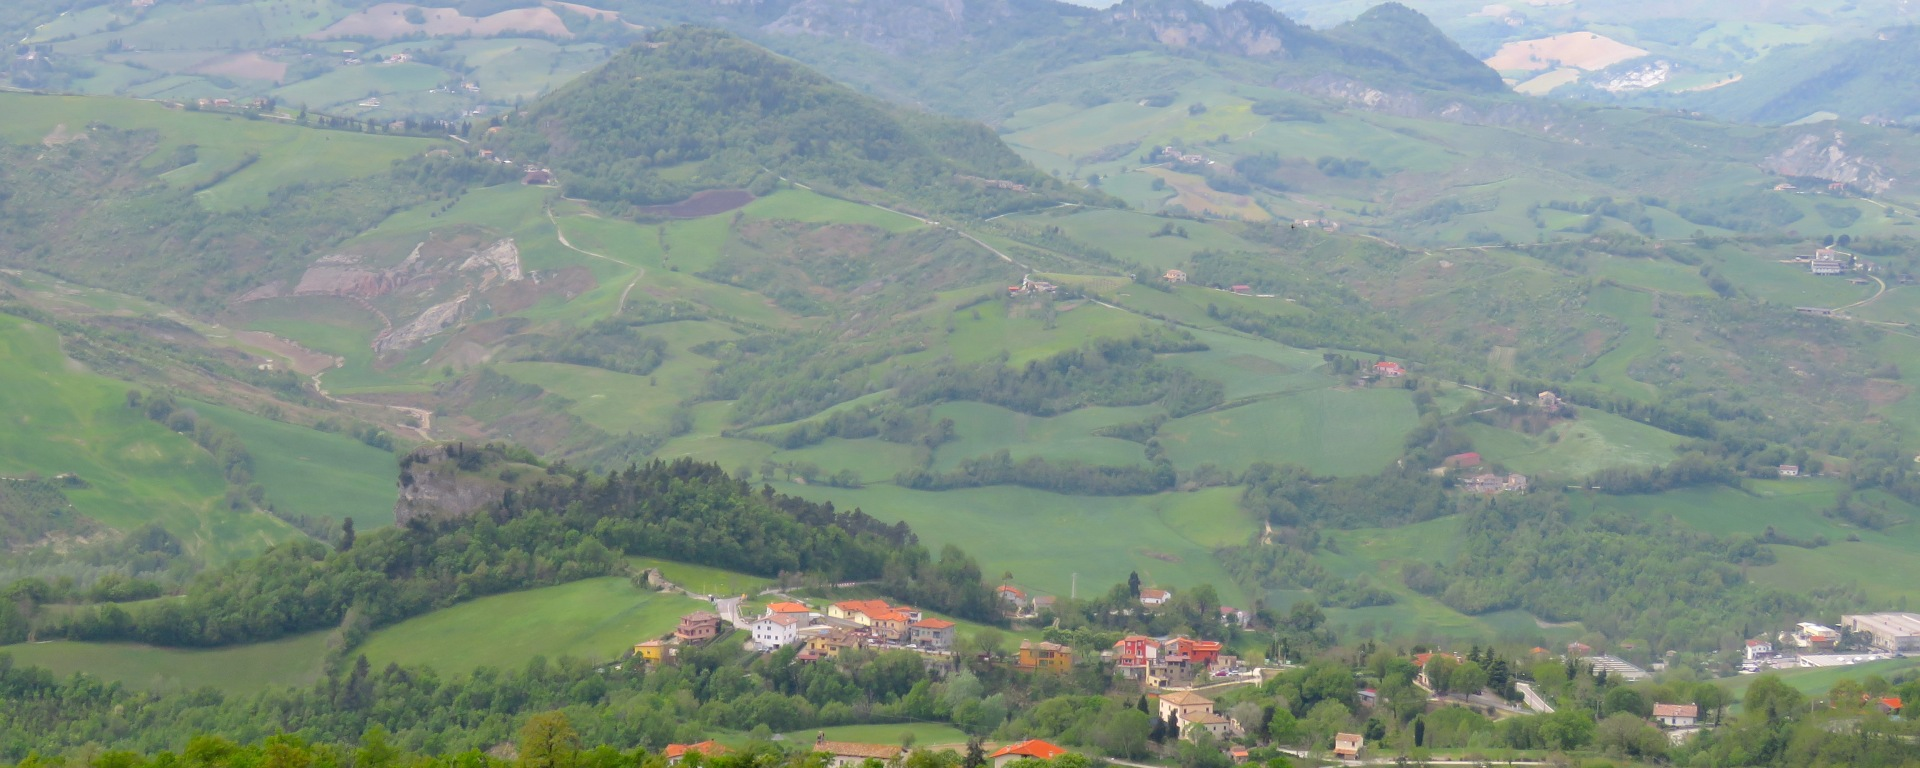 The view from San Marino - by Anika Mikkelson - Miss Maps - www.MissMaps.com